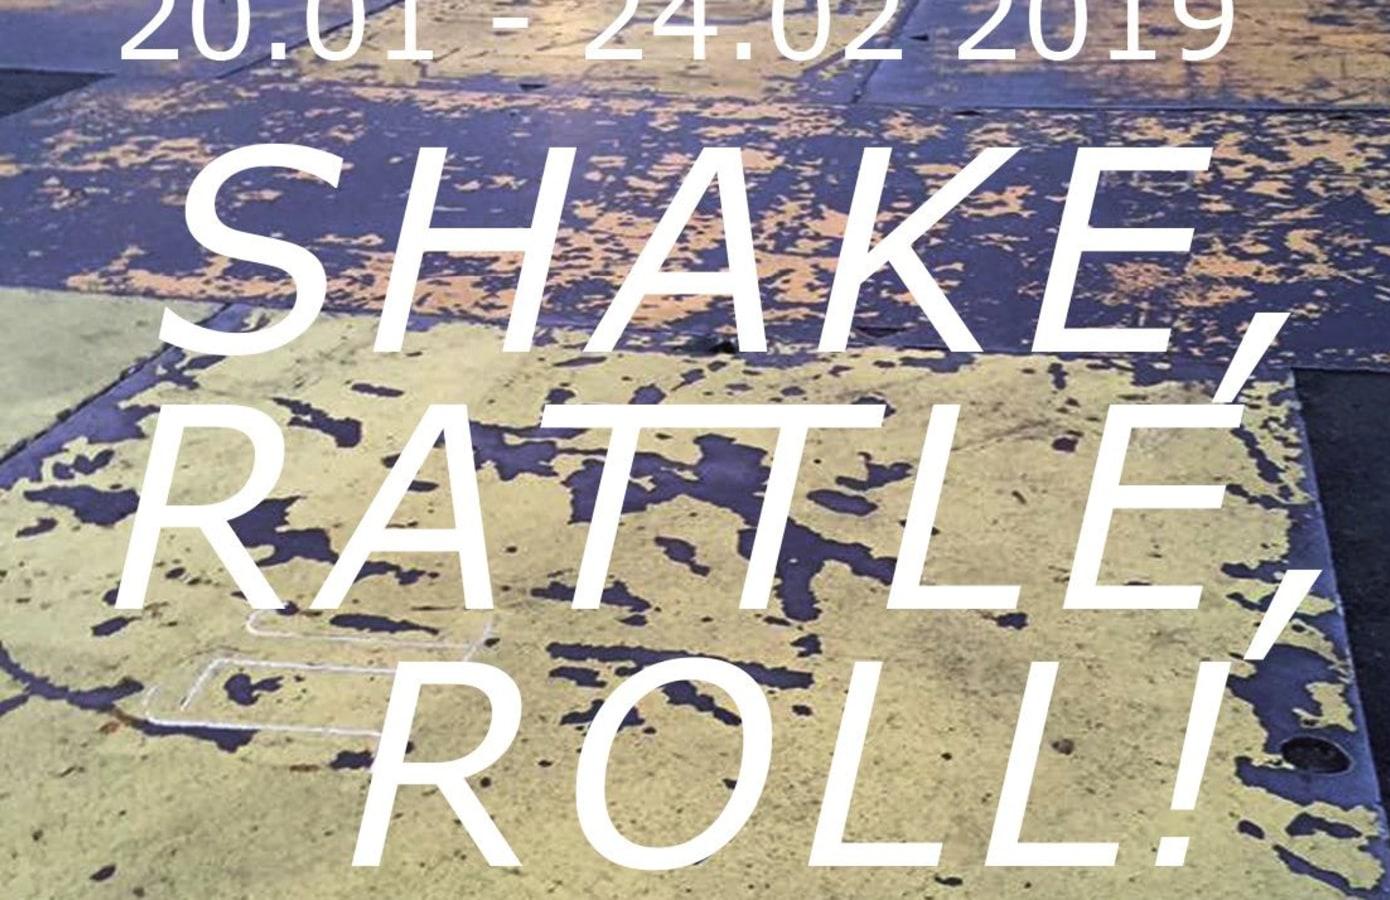 SHAKE RATTLE ROLL!, Ide André, Koen Delaere,